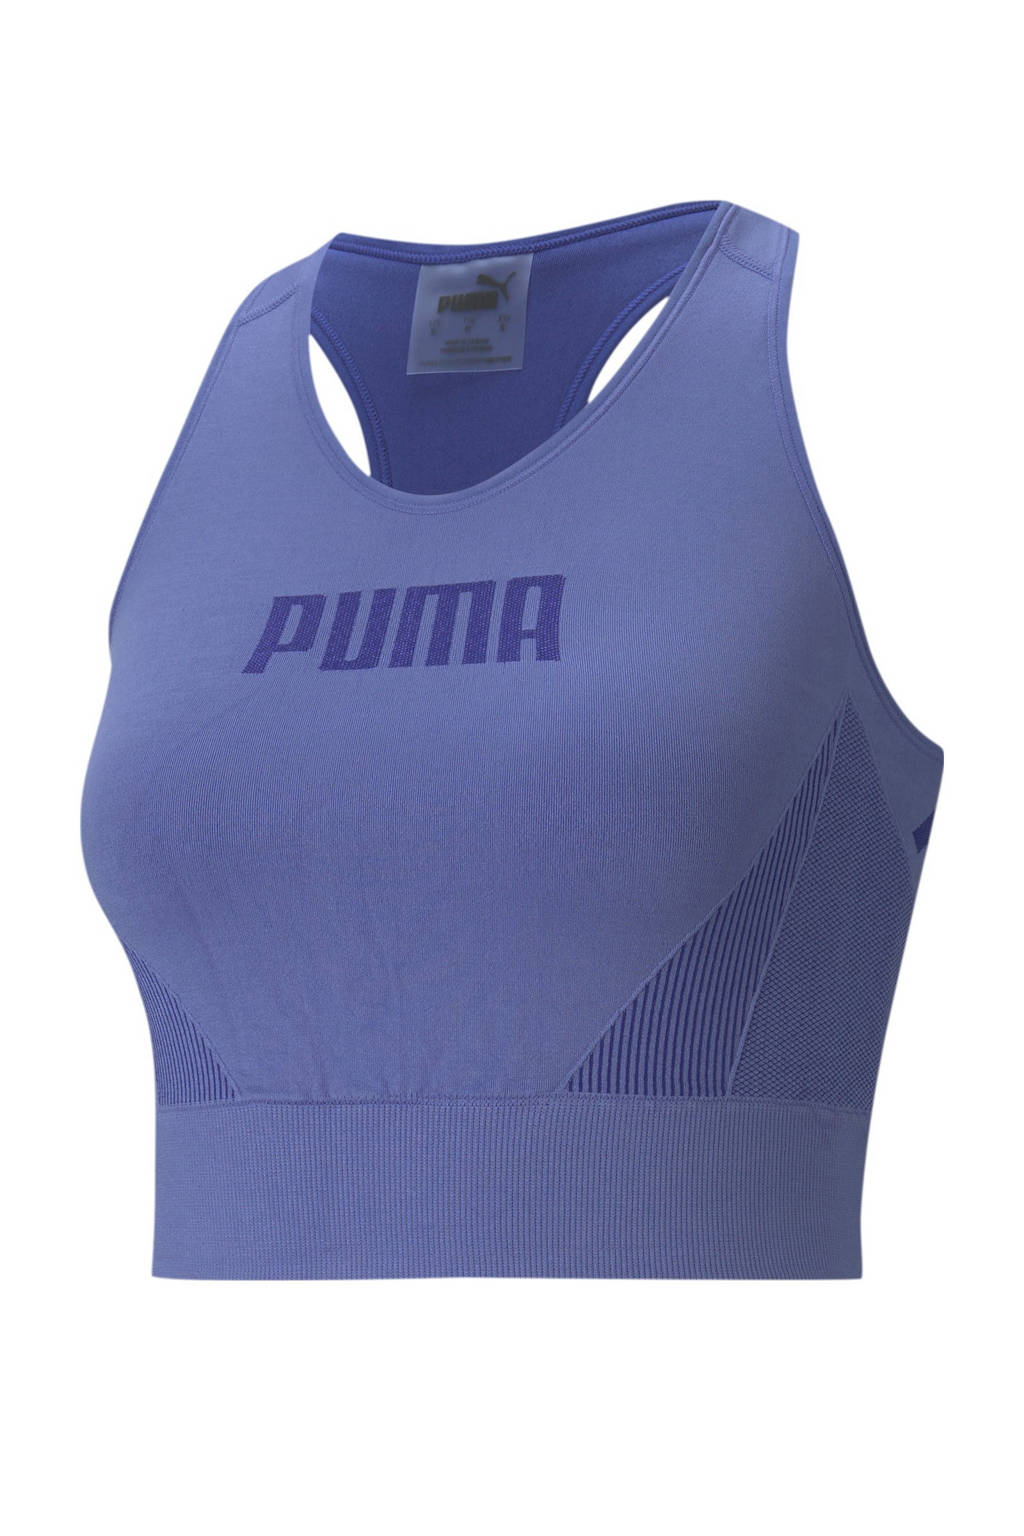 Puma level 1 sport bh blauw, Blauw